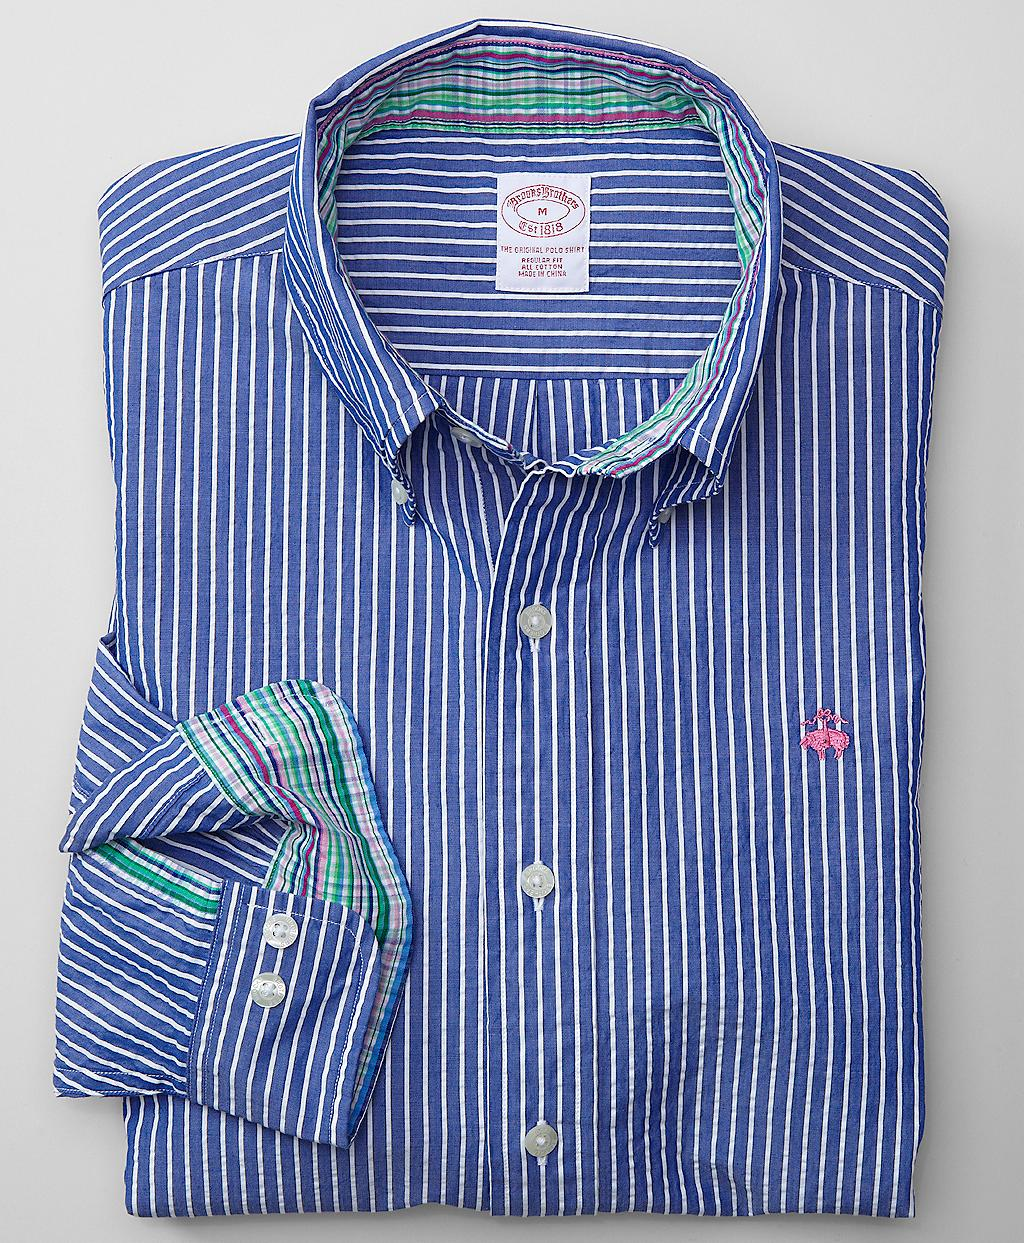 Brooks brothers regular fit ground stripe seersucker sport for Brooks brothers shirt size guide